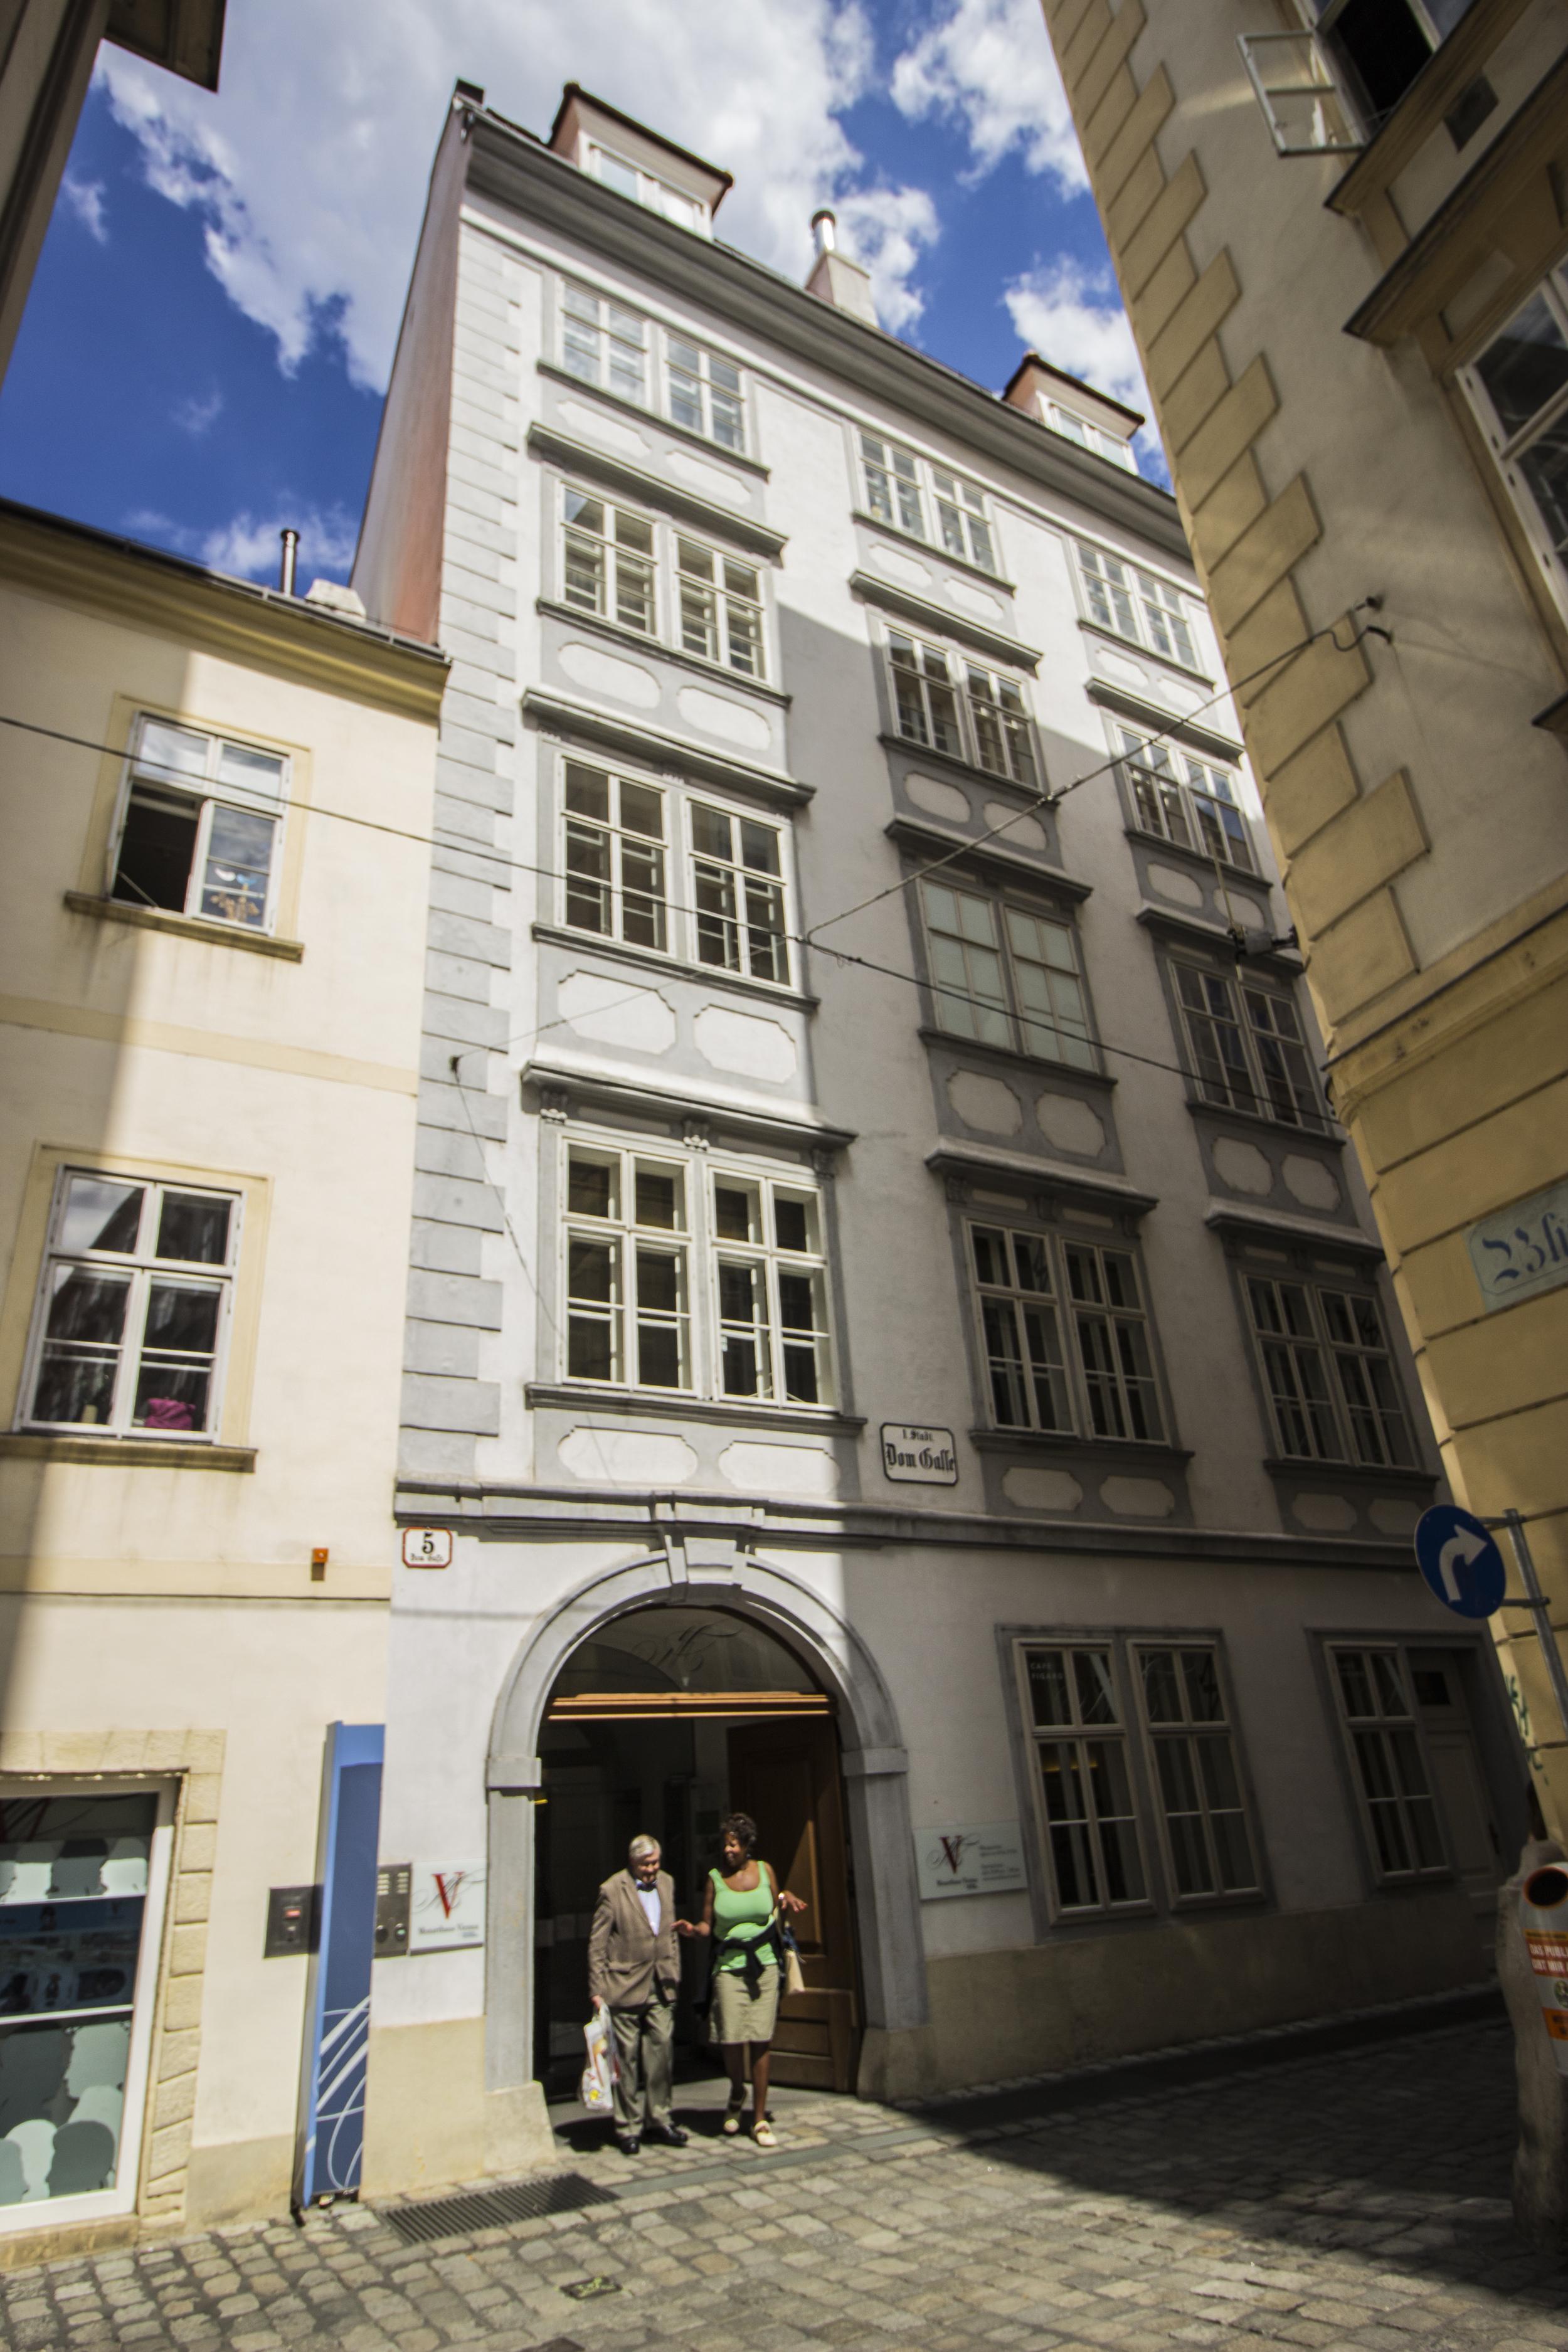 Mozart's house!